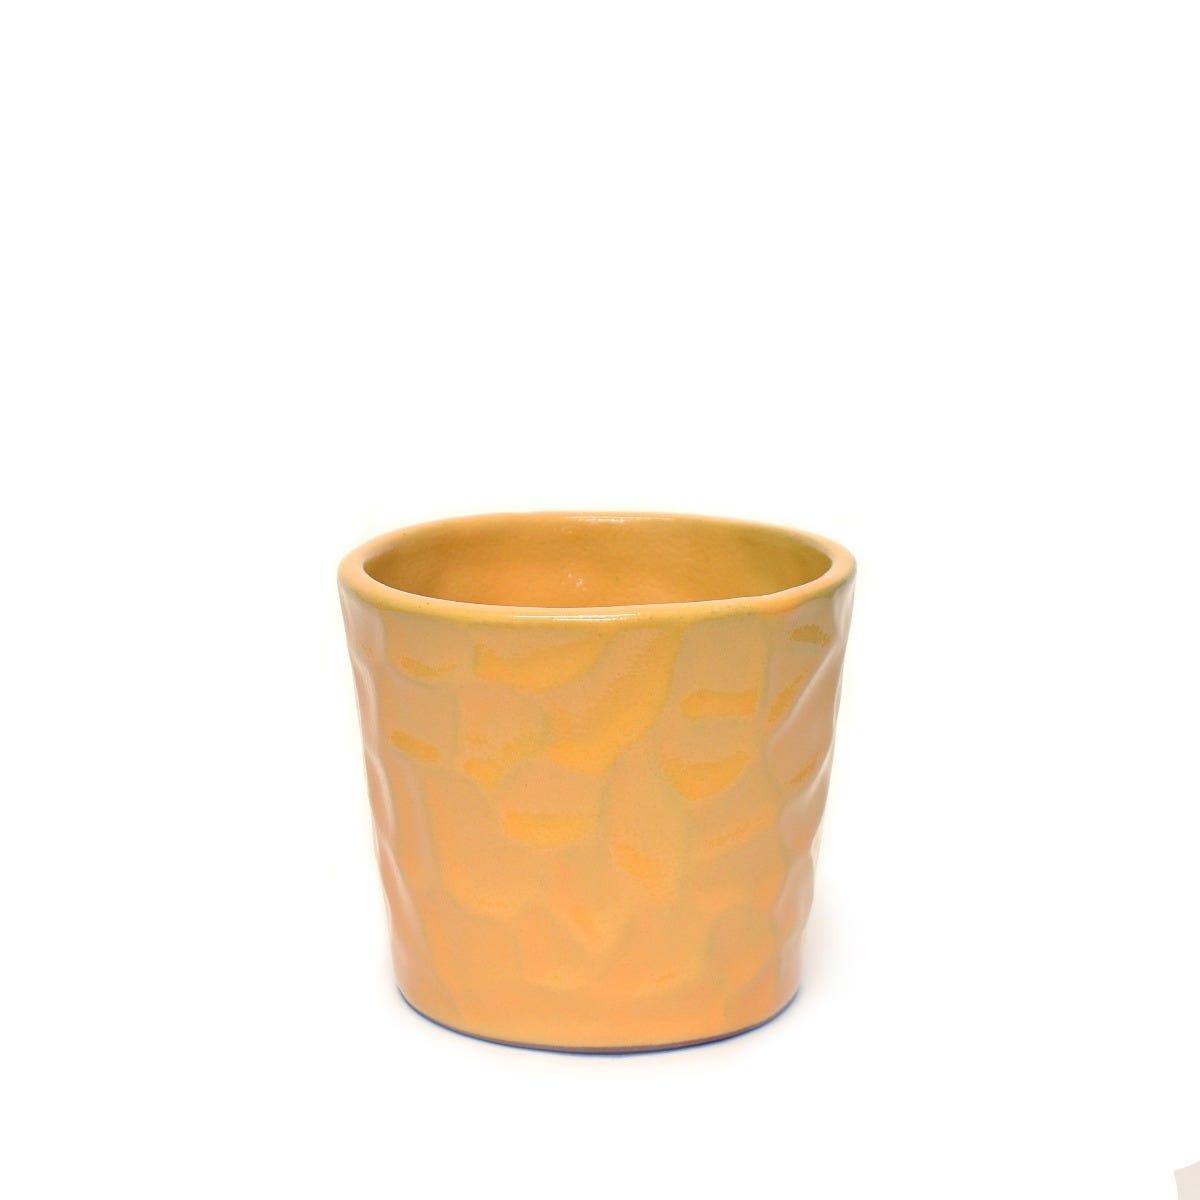 Maceta de pasta de barro rompecabezas artesanal